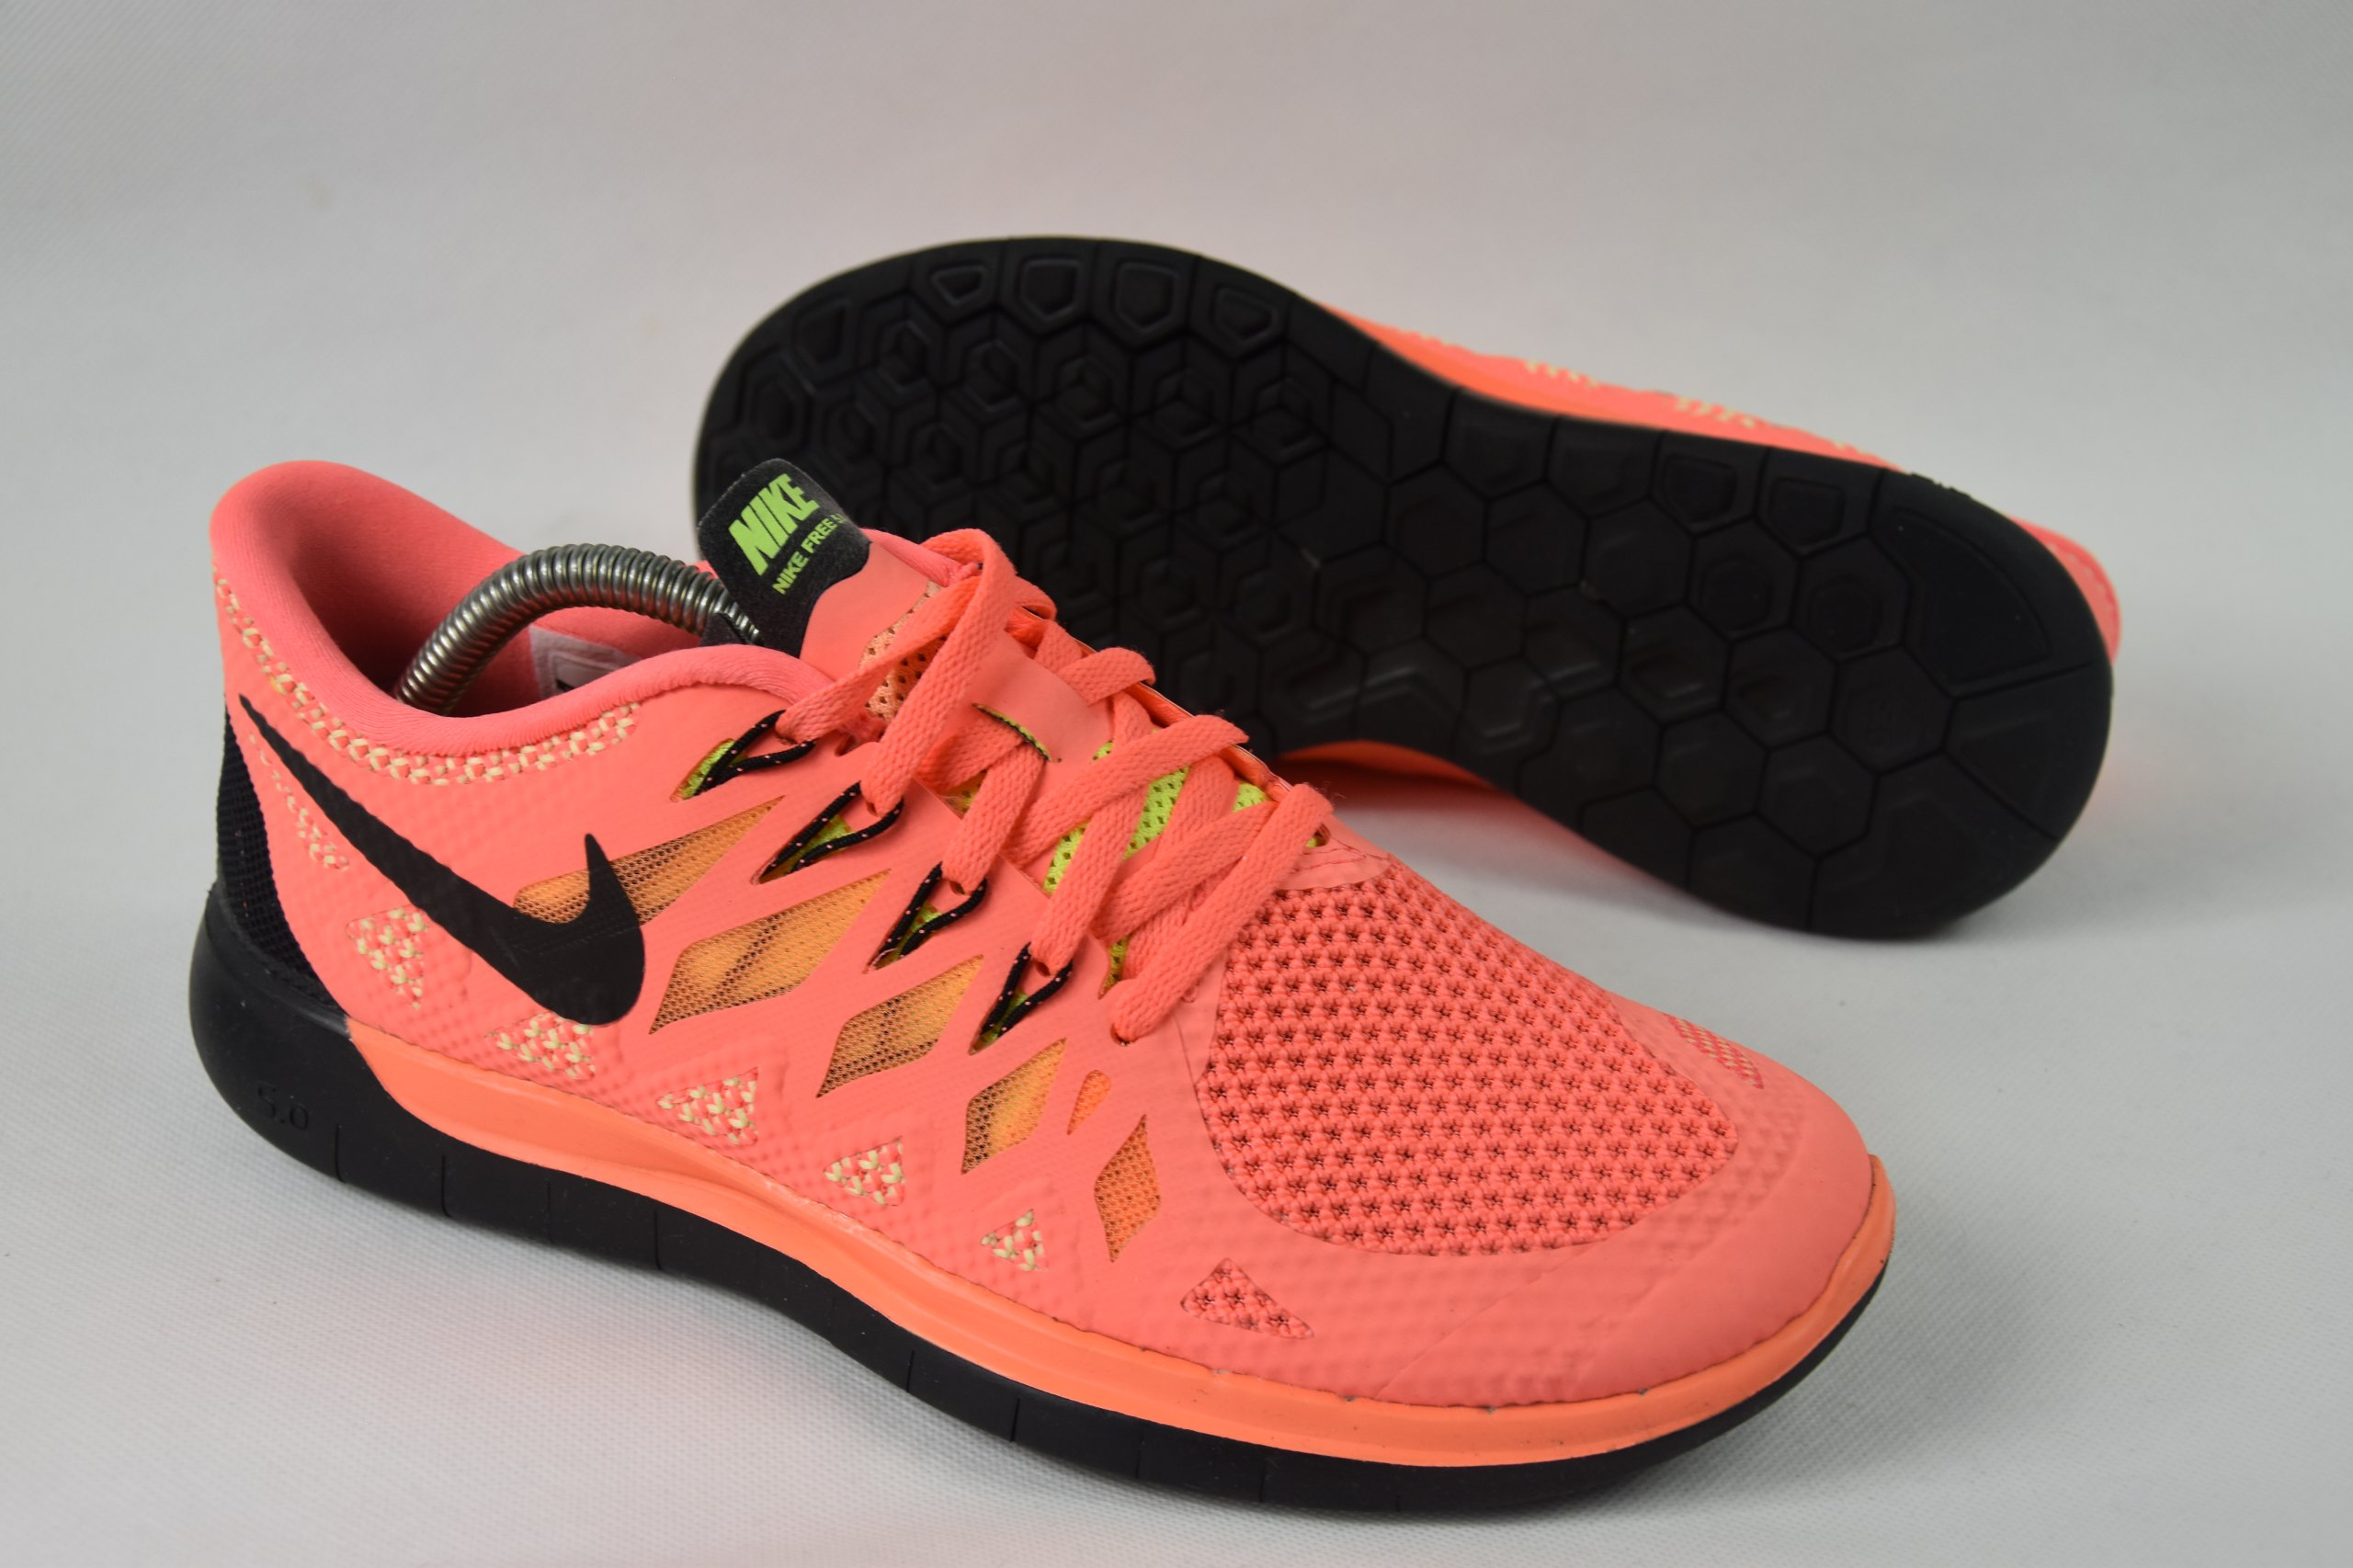 b8cd858635737d Nike Free 5,0 adidasy sportowe r.38,5/24,5cm - 7345781319 ...